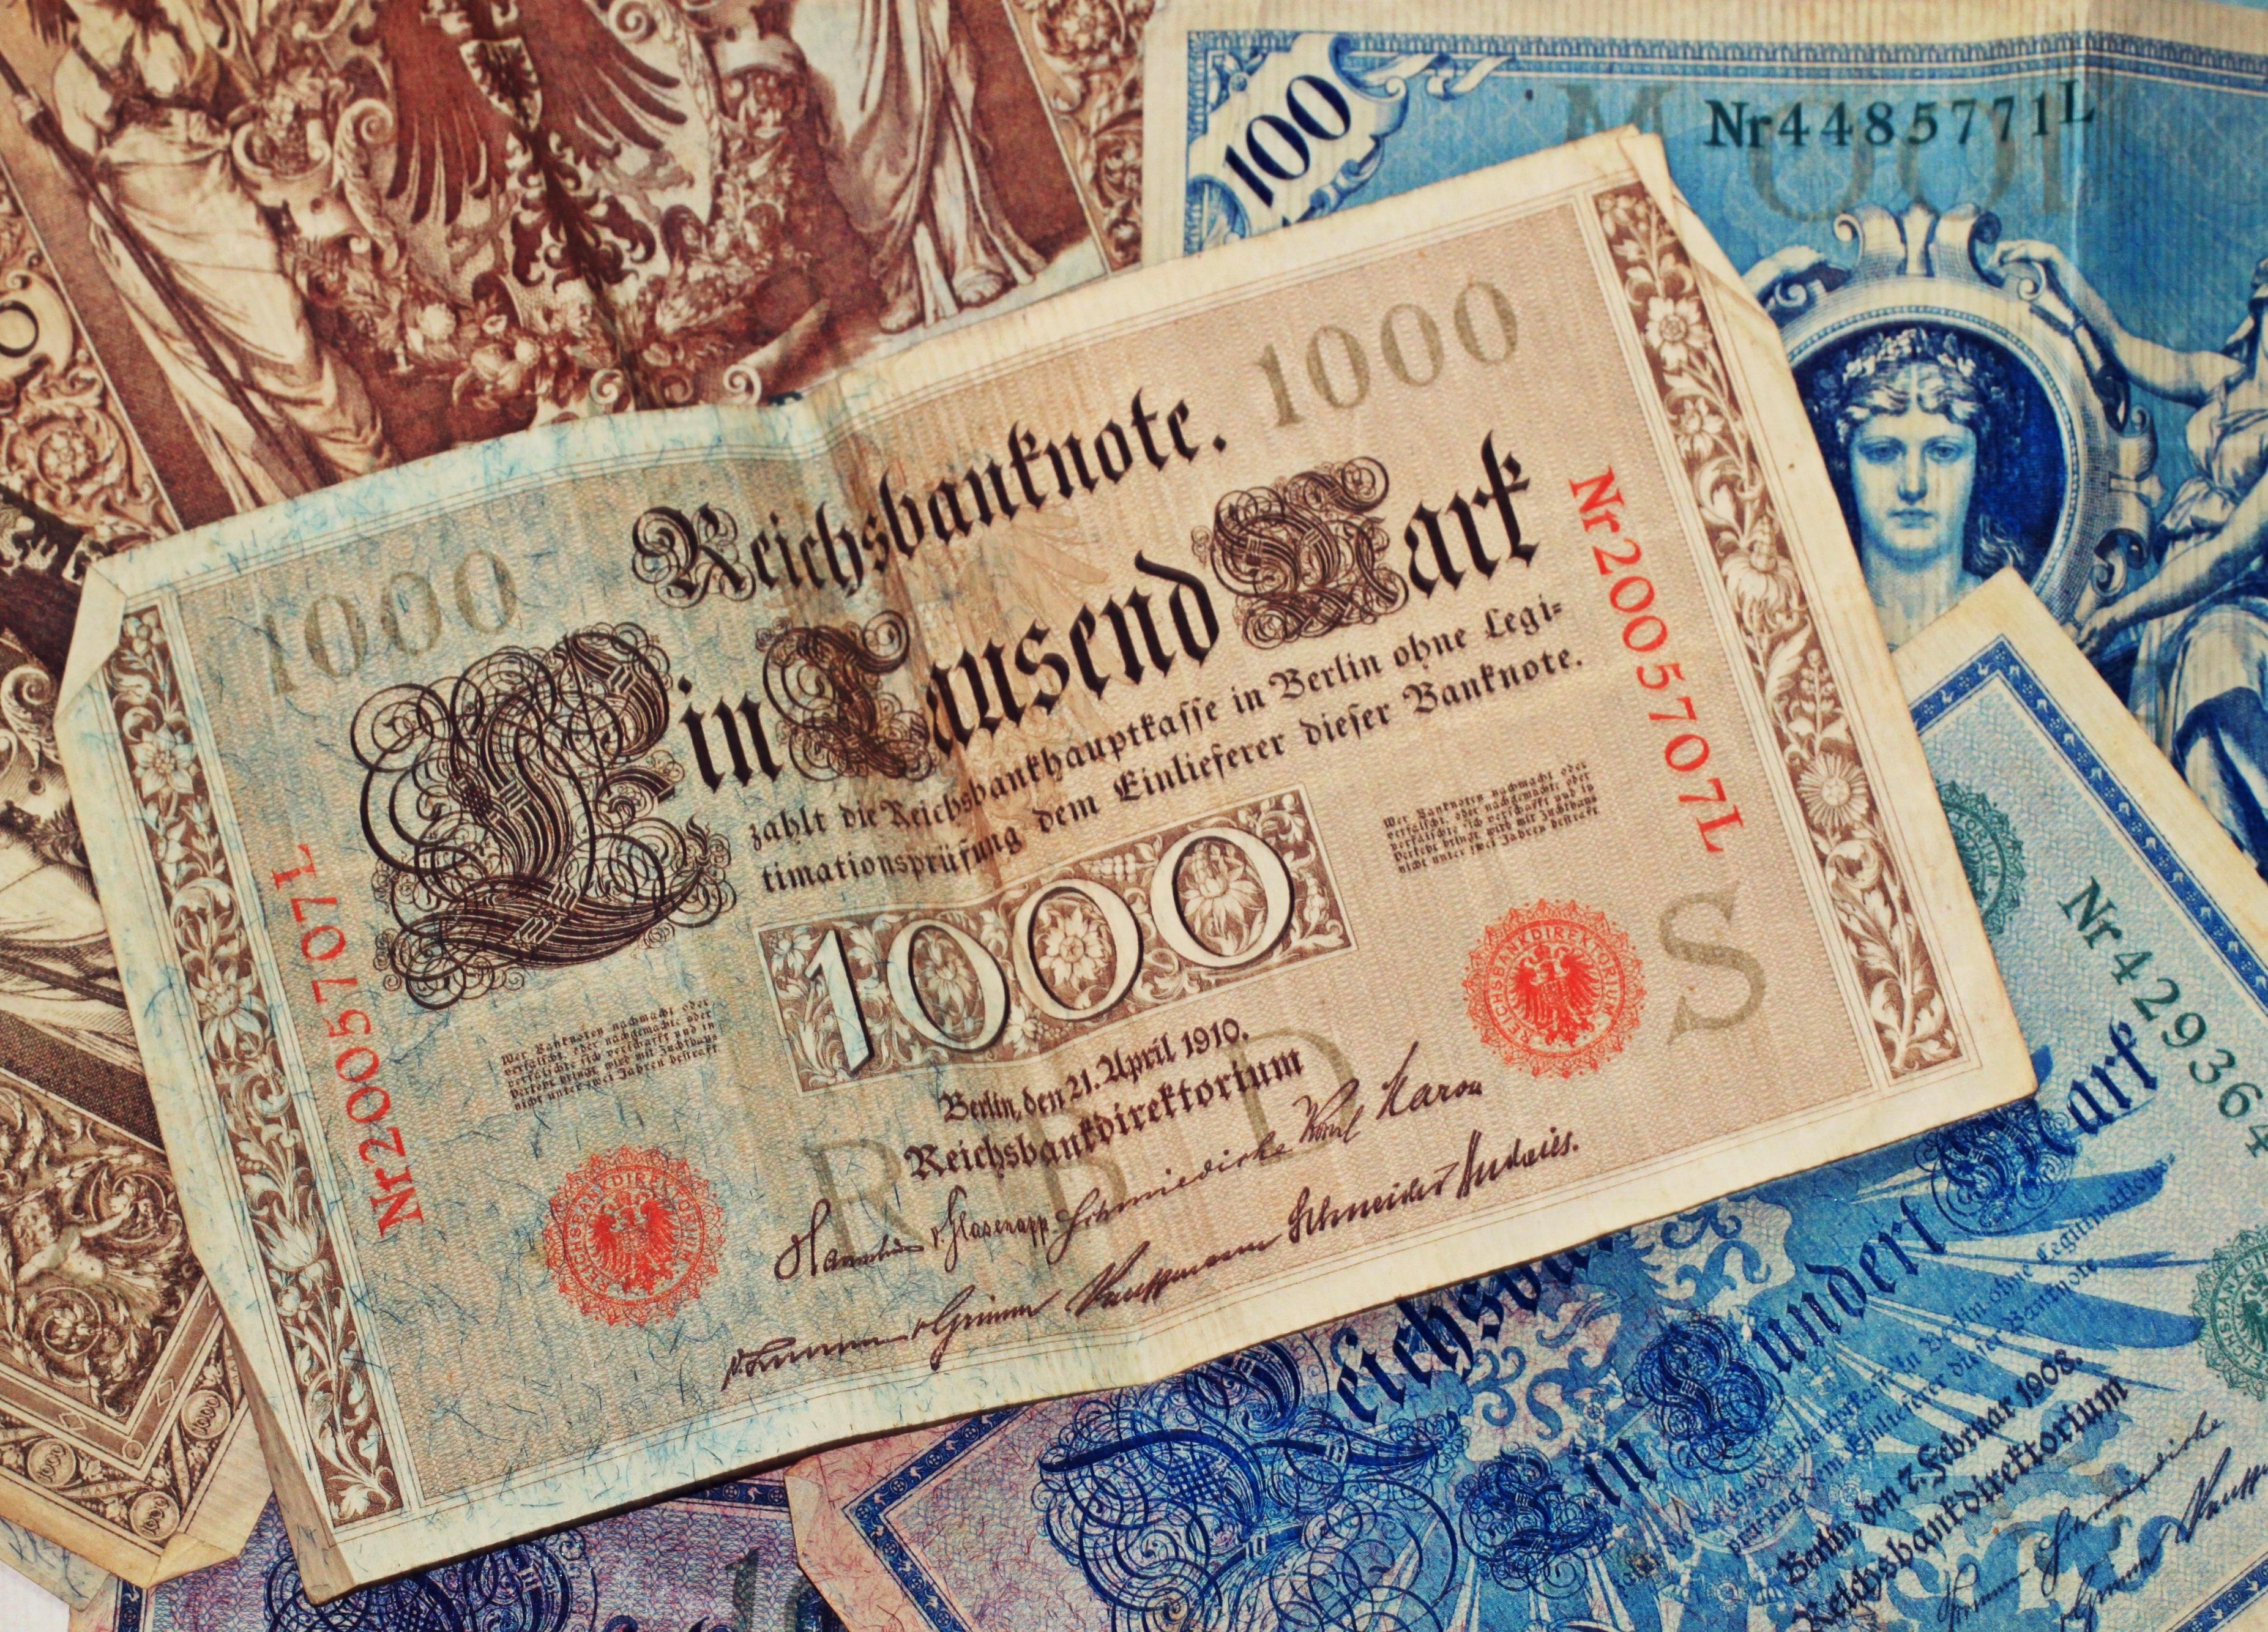 billet de banque traduction allemand